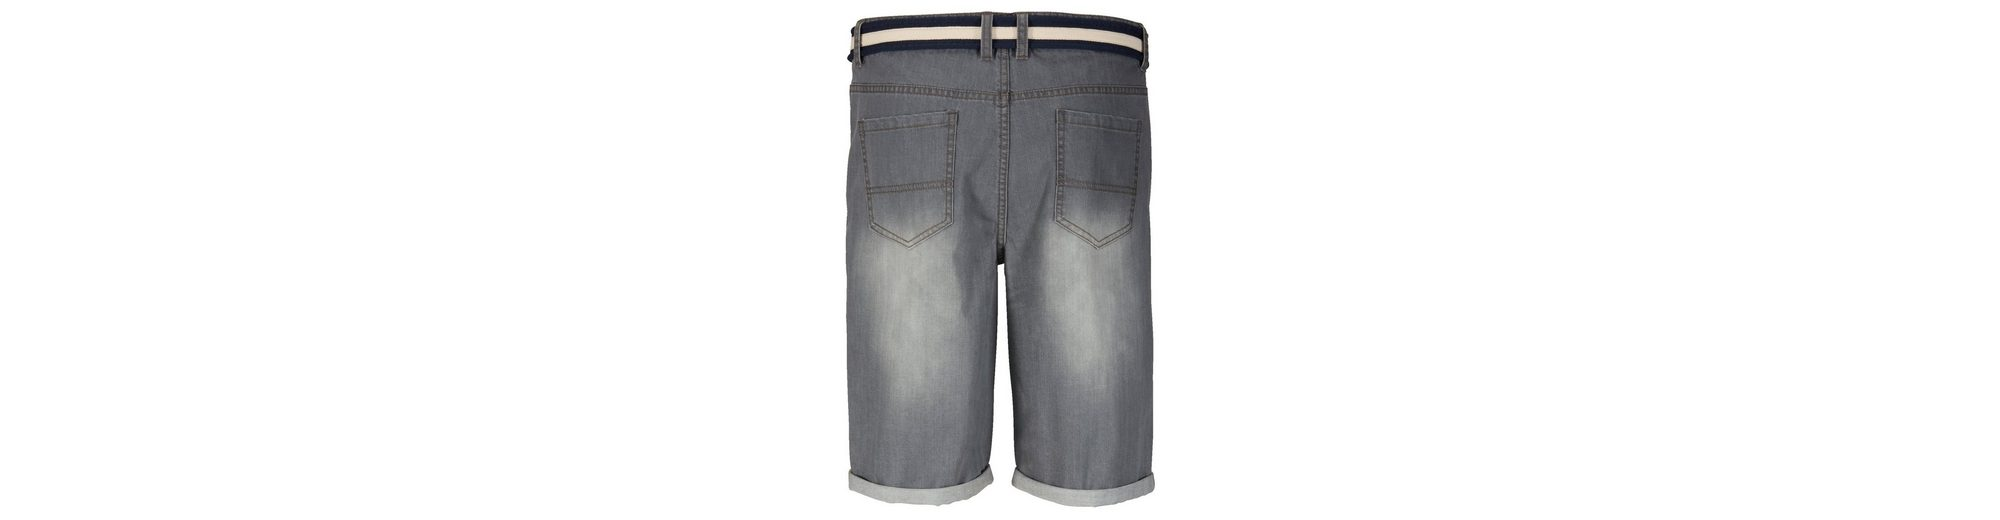 Jeans mit Bermuda Babista mit Bermuda Jeans Jeans Babista Bermuda G眉rtel G眉rtel Babista mit P5w5x4q1